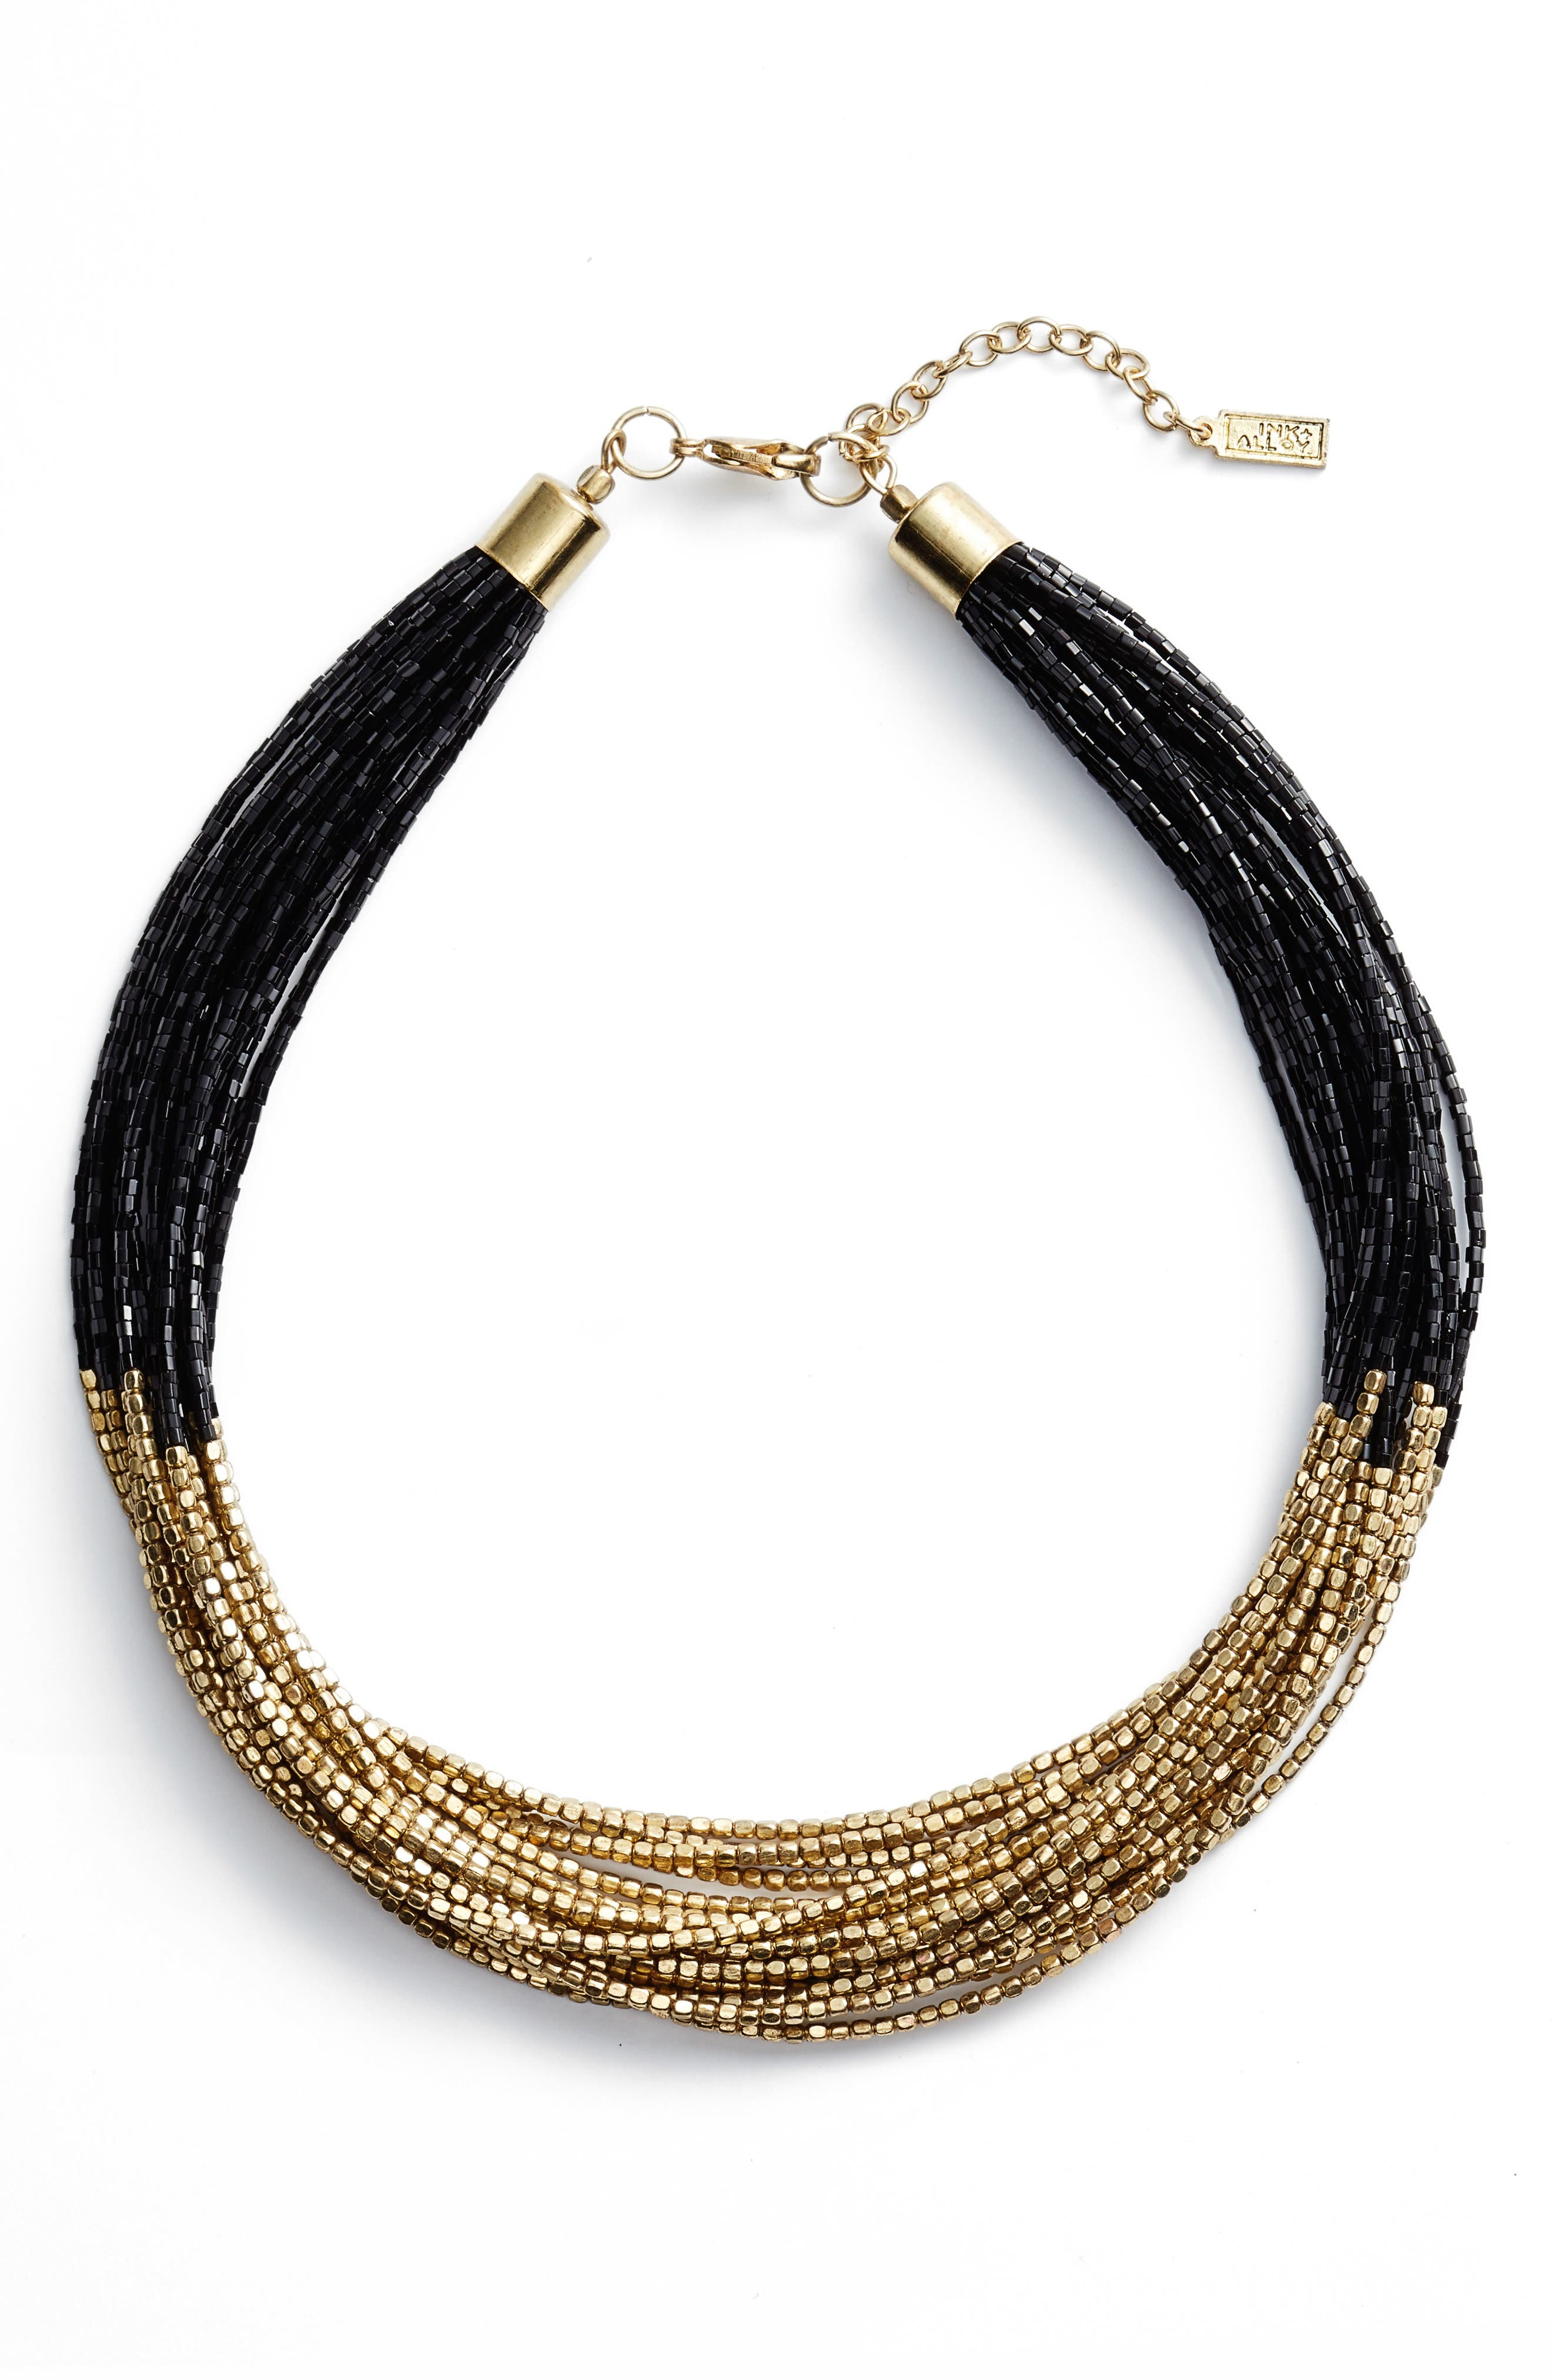 Priya Multistrand Collar Necklace,                             Main thumbnail 1, color,                             710